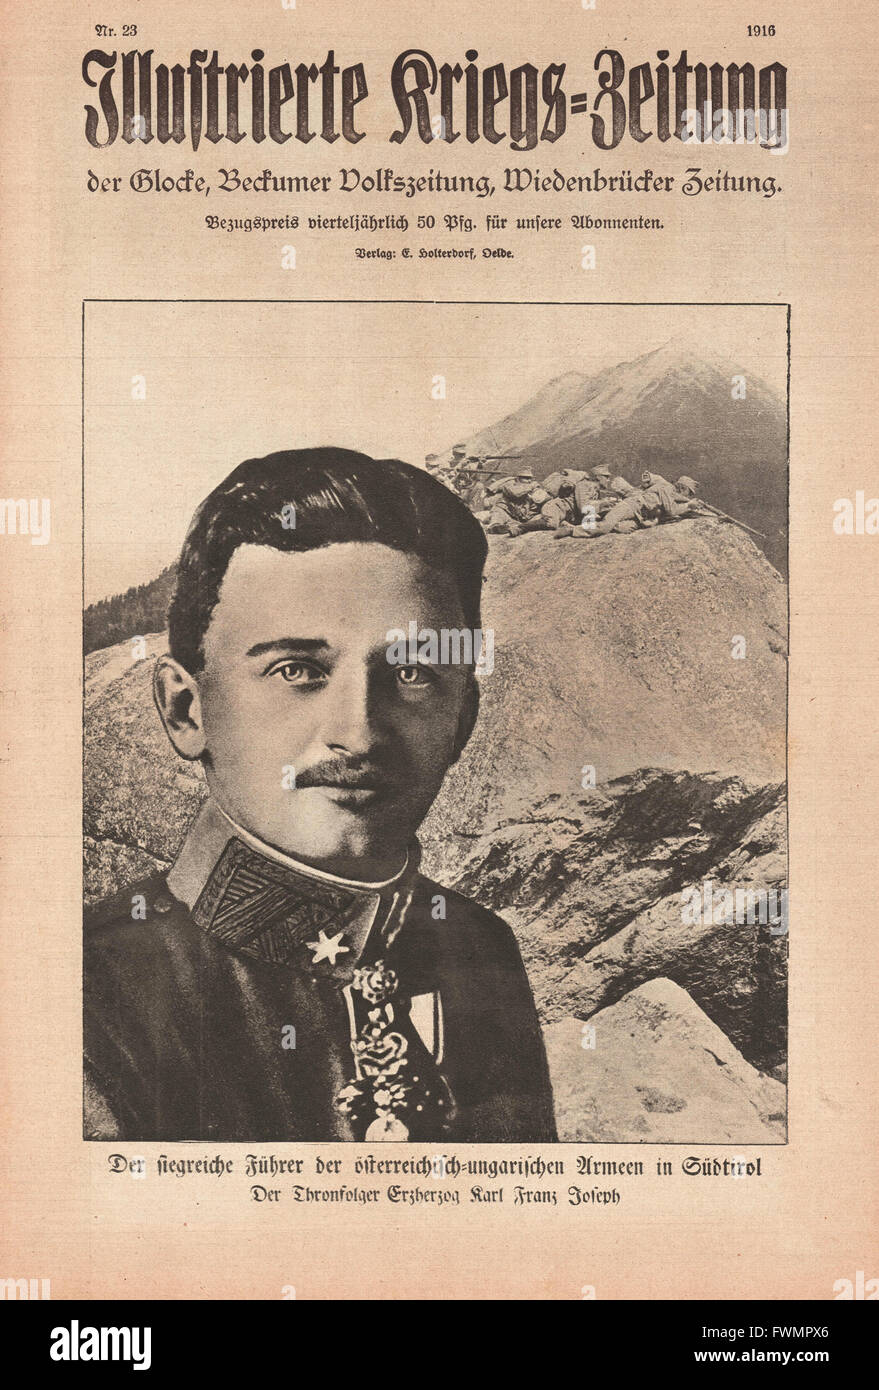 1916 Illustrierte Kriegs-Zeitung front page Charles I of Austria Stock Photo